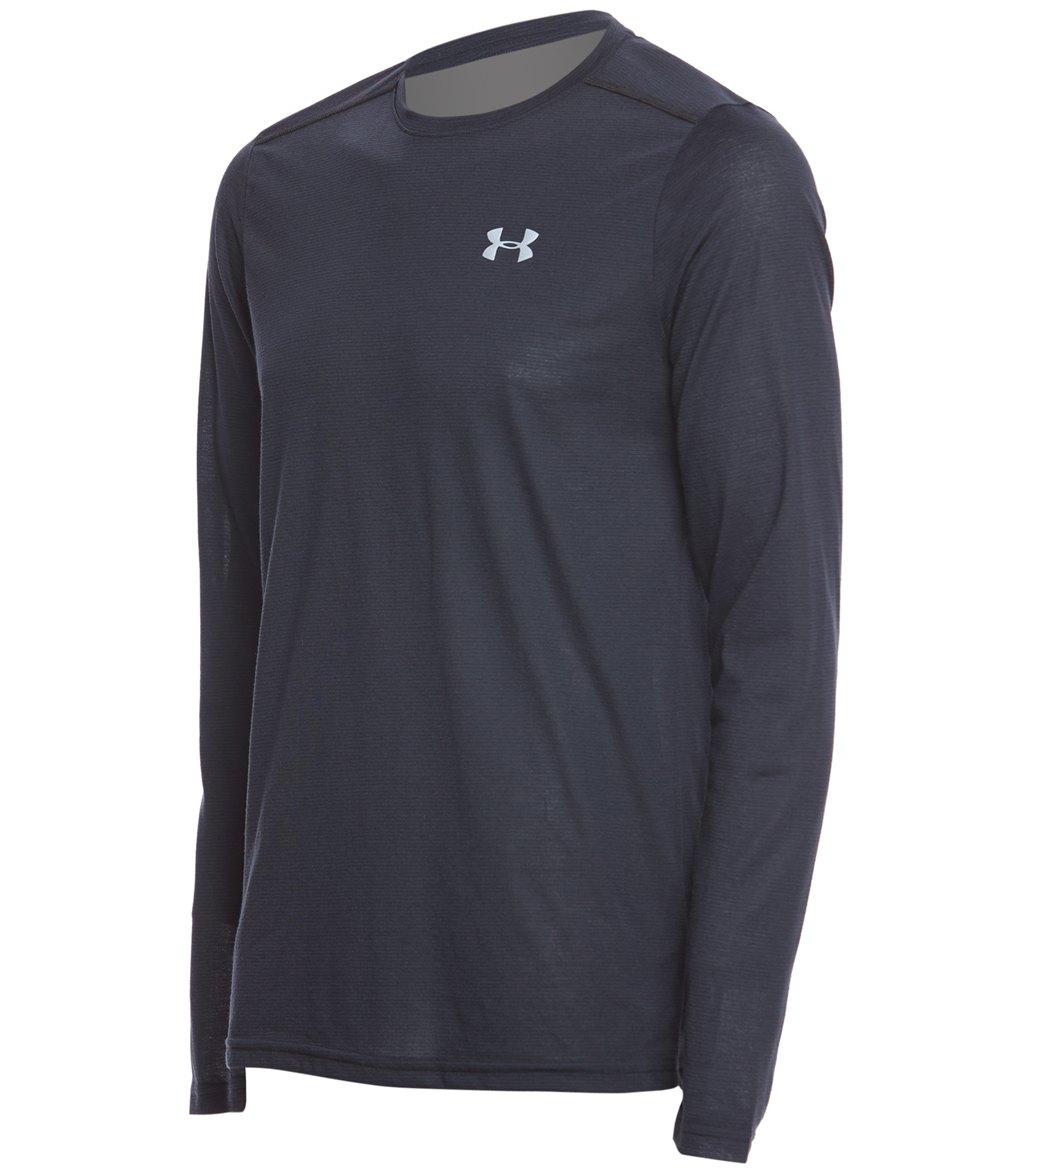 2ad84a09 Under Armour Men's UA Streaker Run Long Sleeve T-Shirt